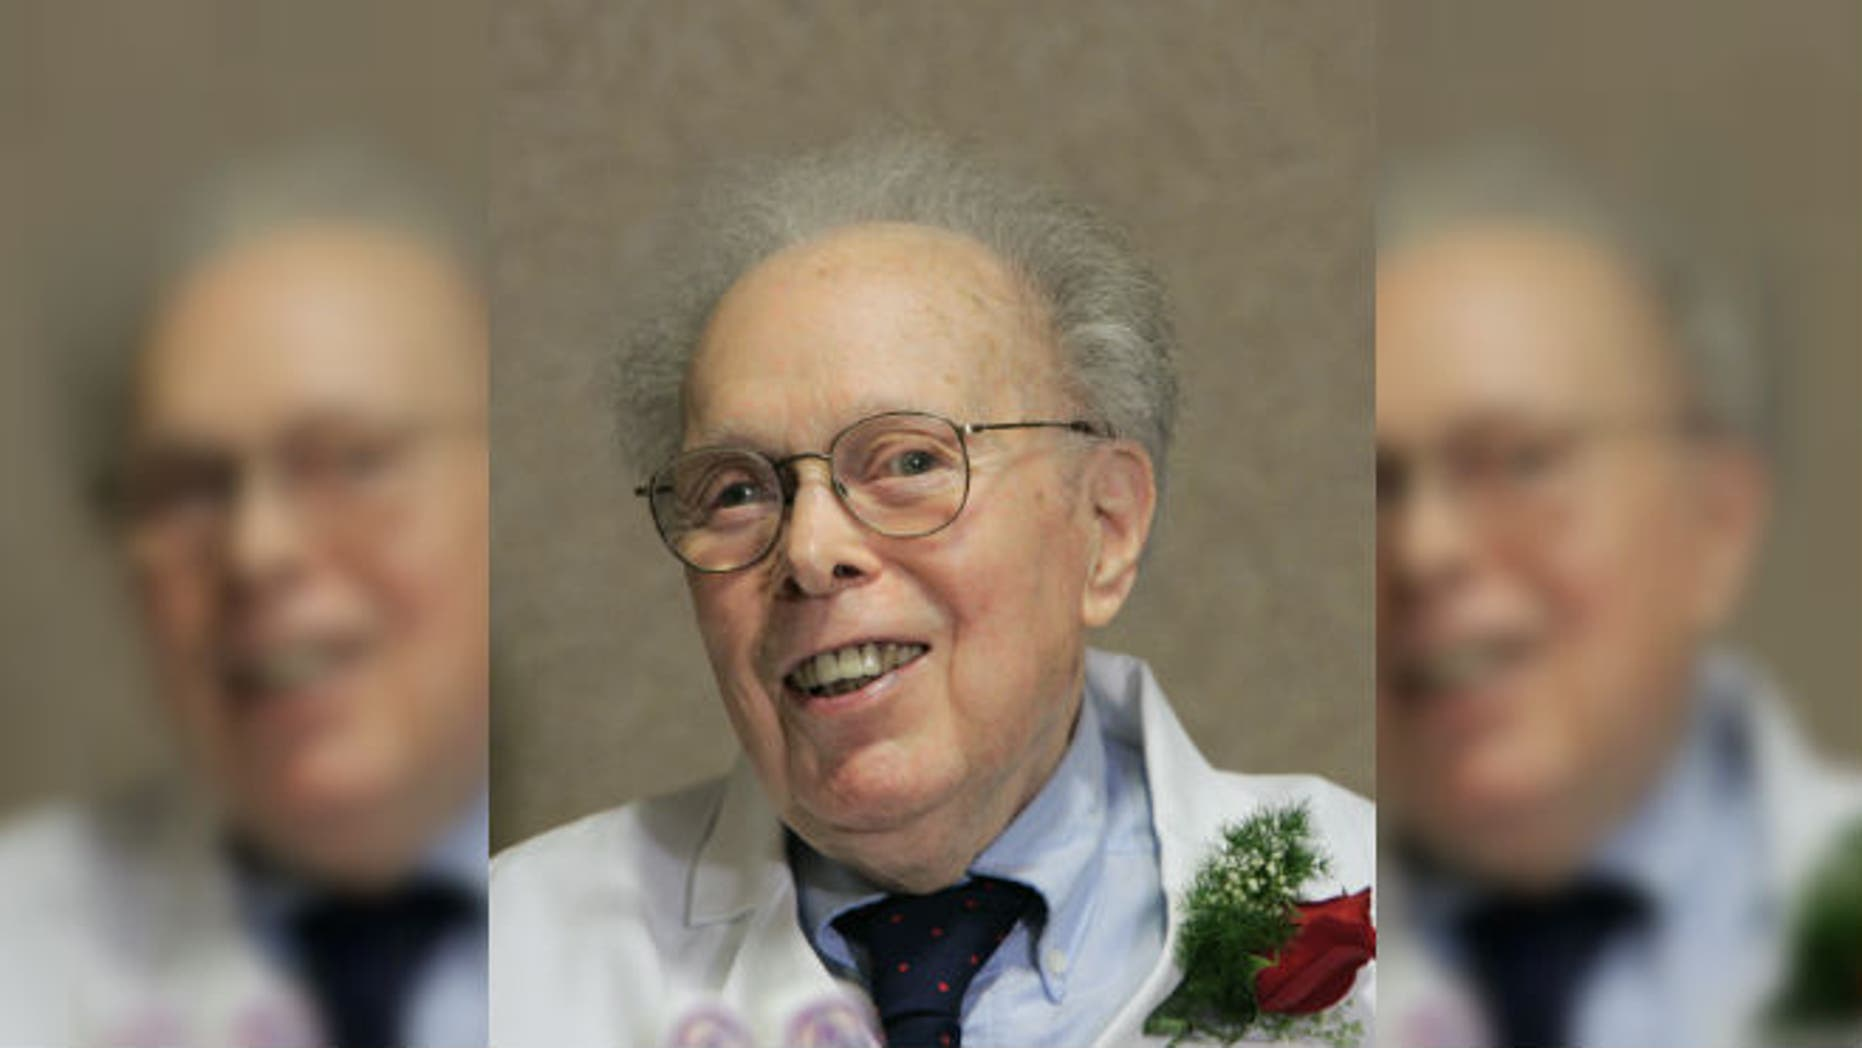 In this photo taken on Feb. 14, 2006, Dr. Denham Harman smiles at his 90th birthday celebration at the University of Nebraska Medical Center in Omaha, Neb. (AP Photo/Nati Harnik)